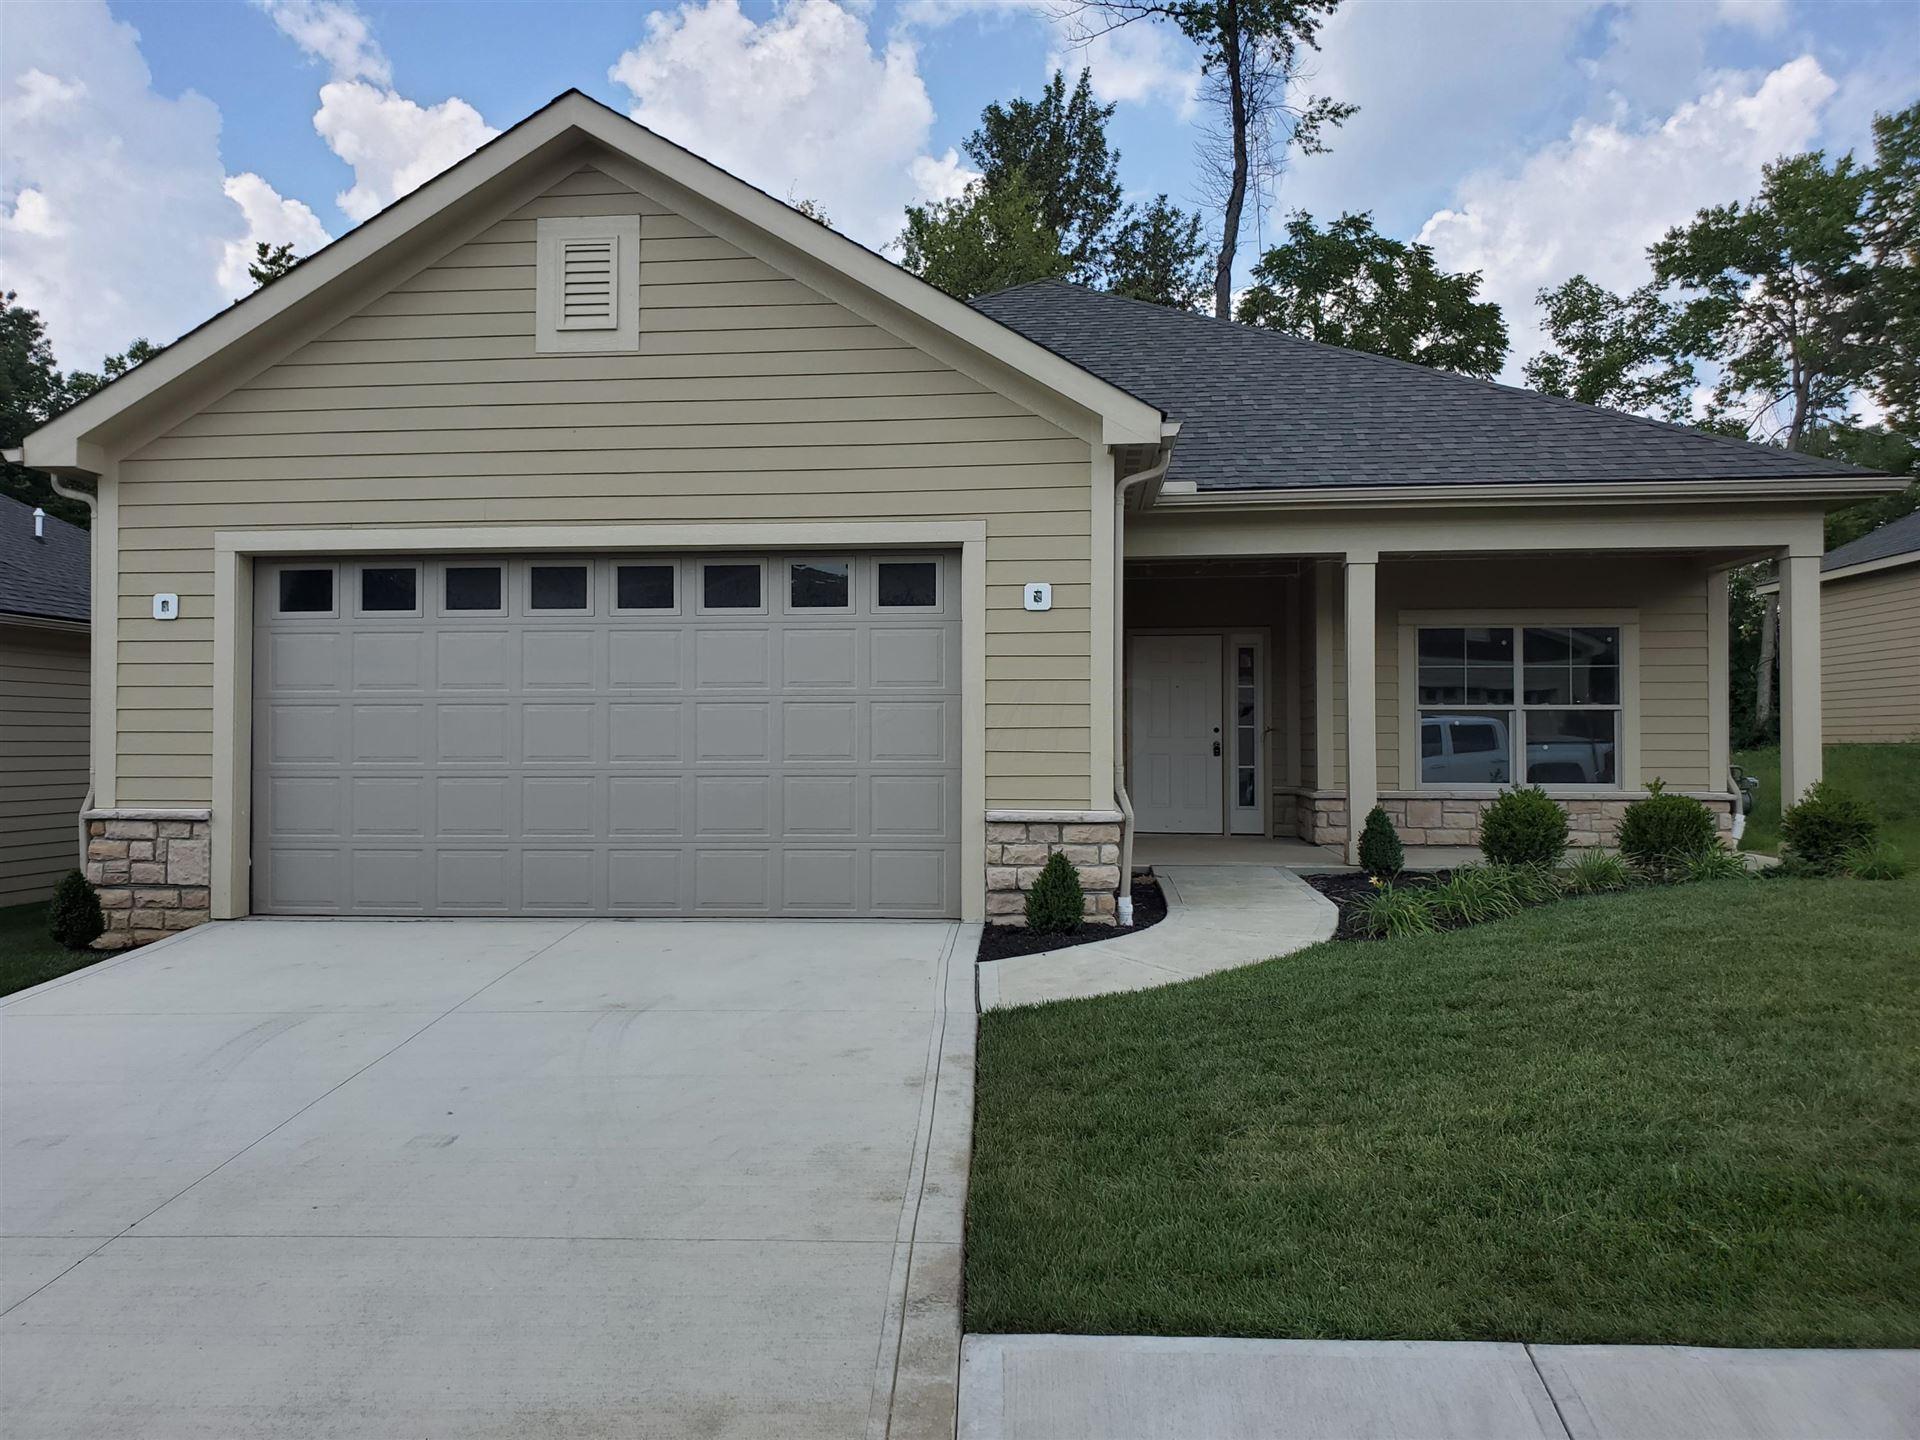 1134 Cross Creeks Ridge, Pickerington, OH 43147 - MLS#: 220032976